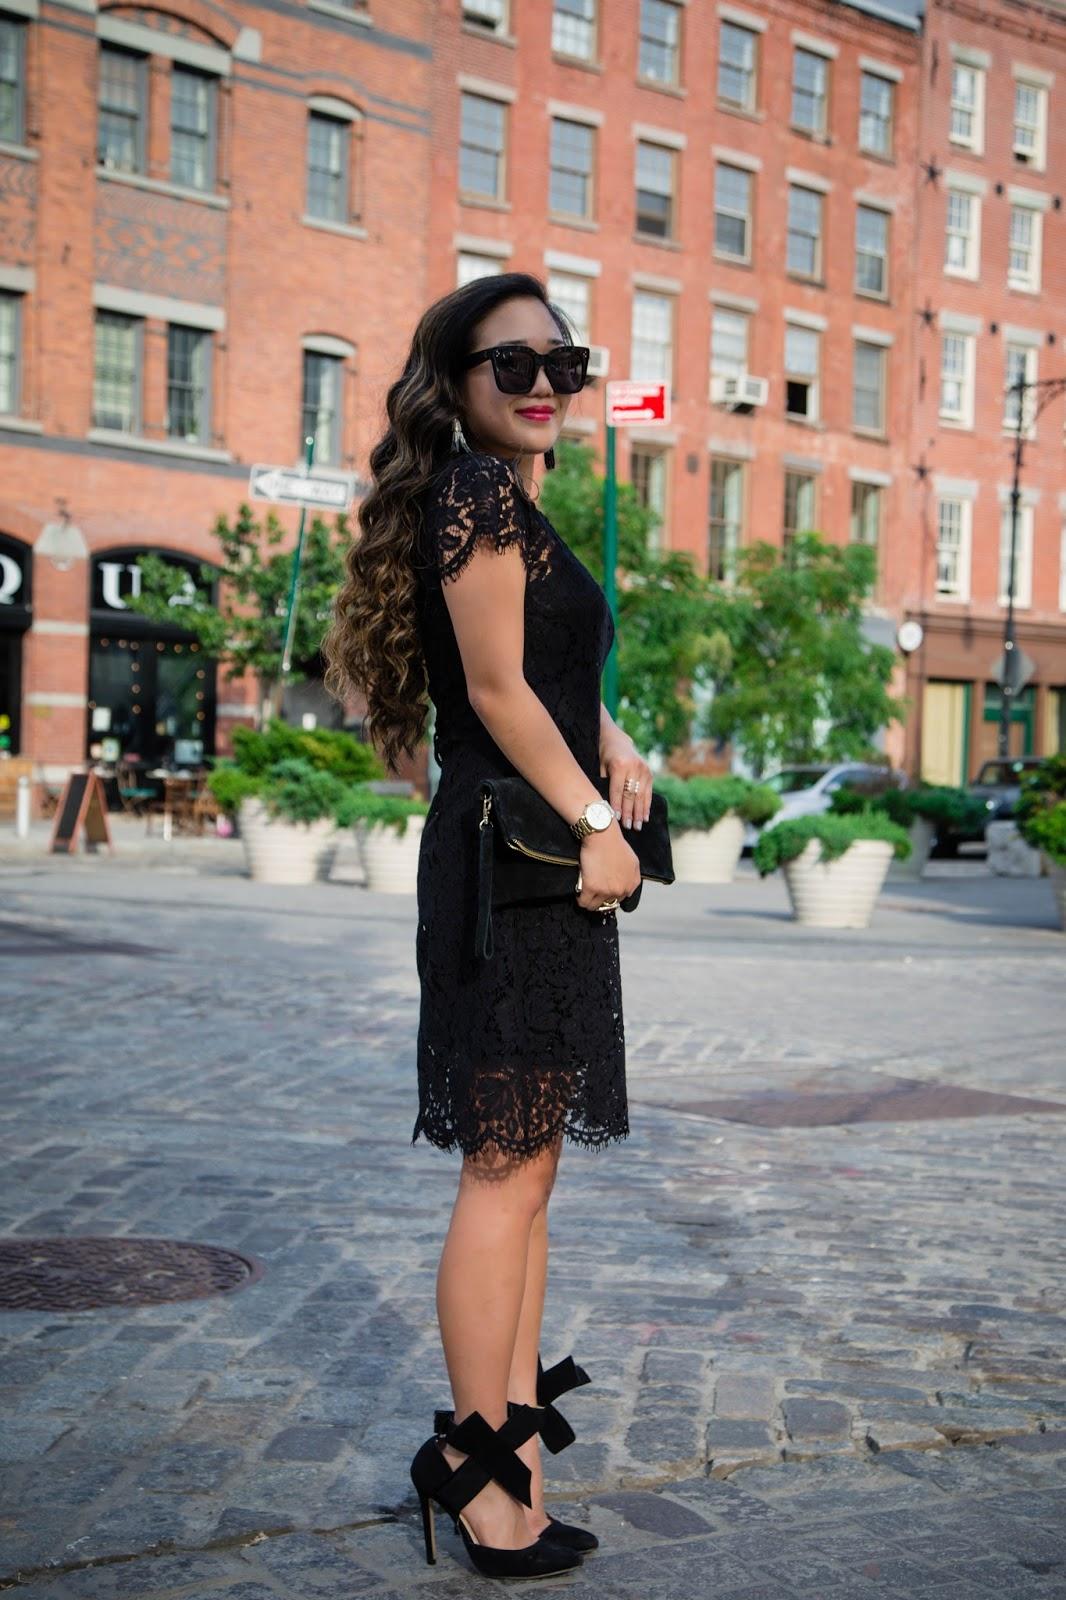 15c3136d188f NYFW Lidl Fashion Event by Heidi Klum